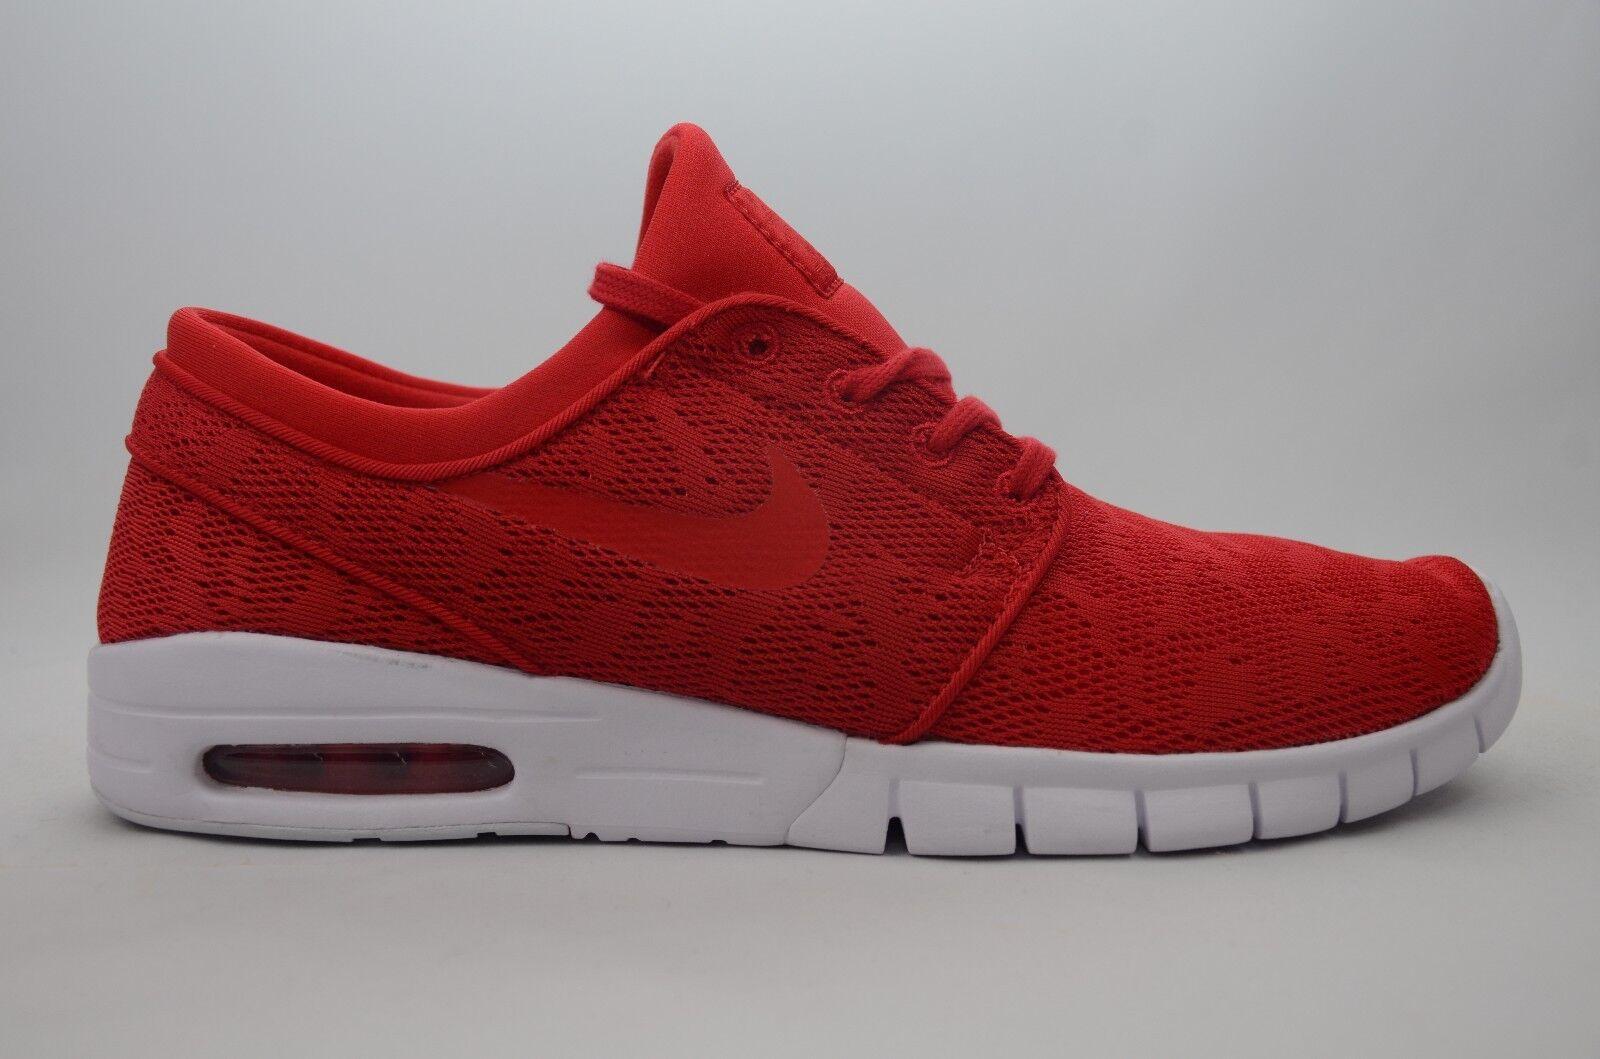 Nike Stefan Janoski Max Red/White Men's Size 8.5-11 New in Box 631303 662